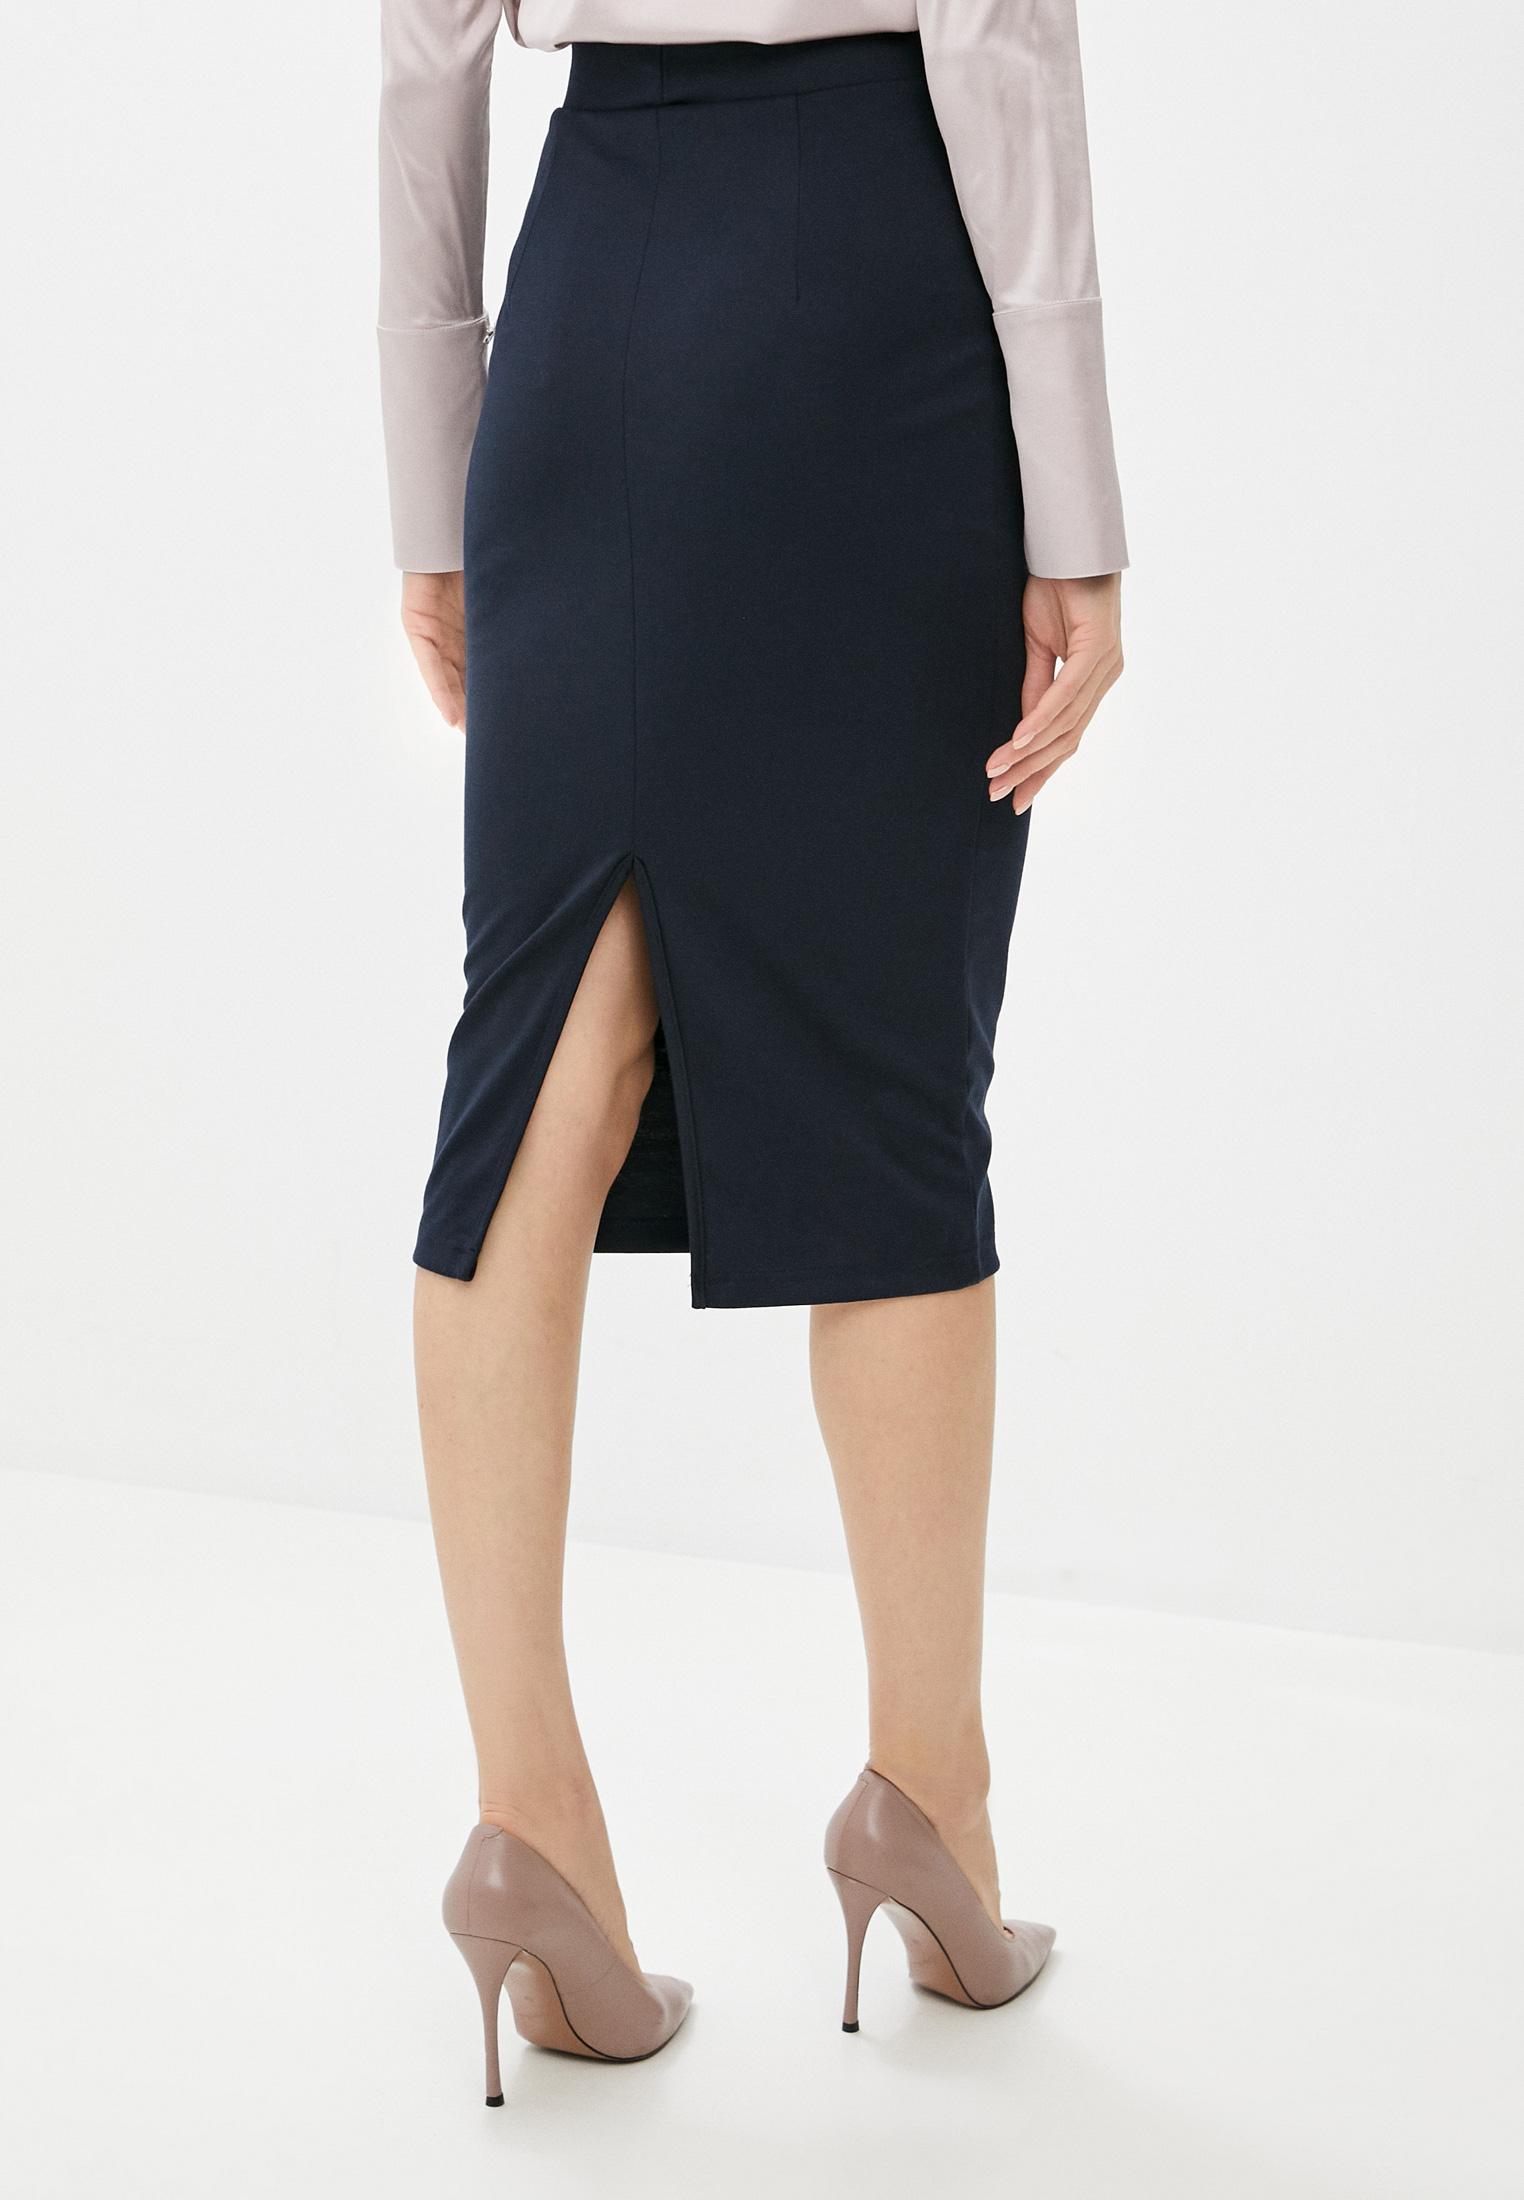 Узкая юбка Toku Tino TT8518027b/: изображение 3